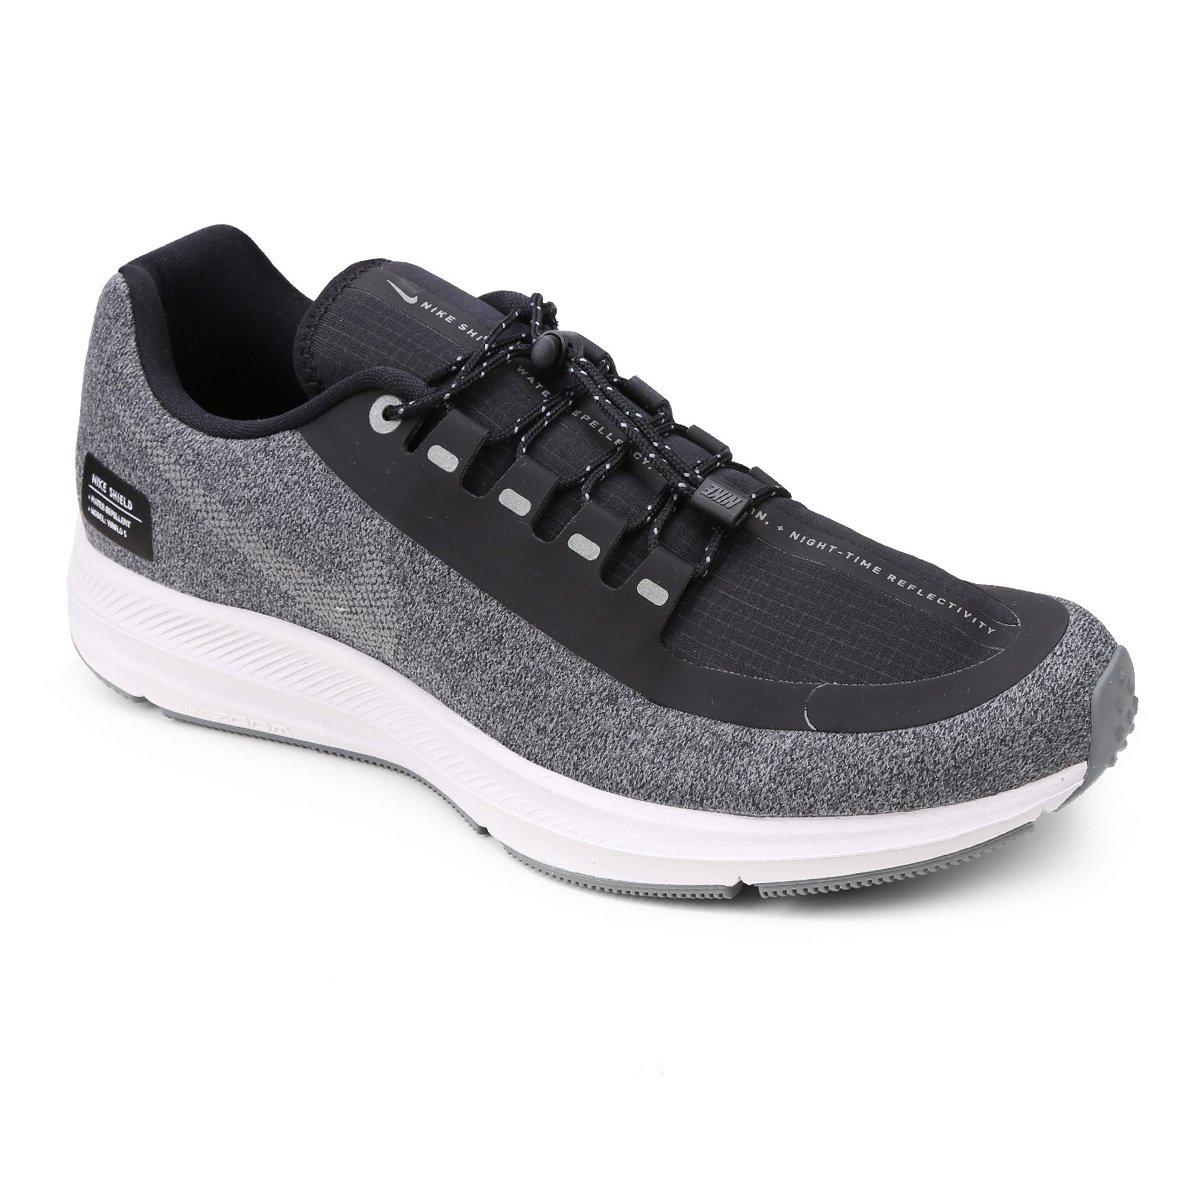 58a1a49ff Tênis Nike Zoom Winflo 5 Run Shield Masculino - Compre Agora